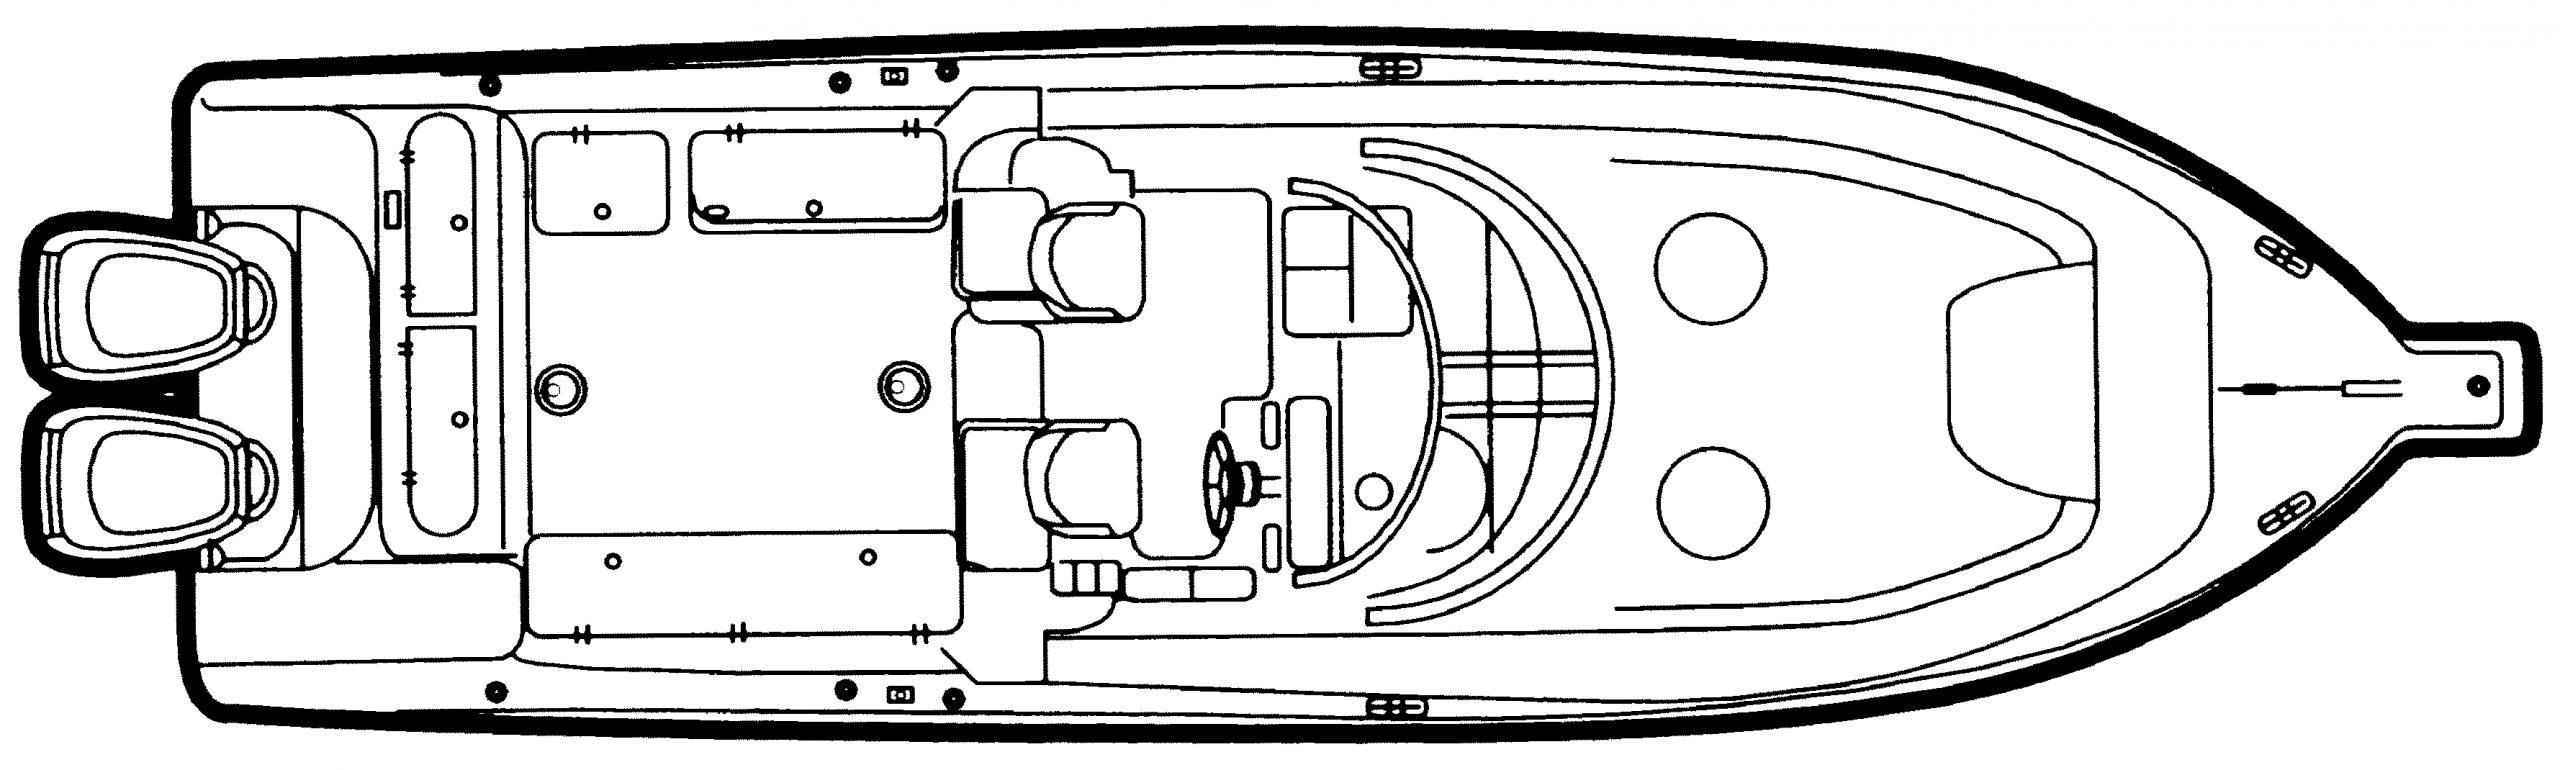 3100-3200 Walkaround Floor Plan 1